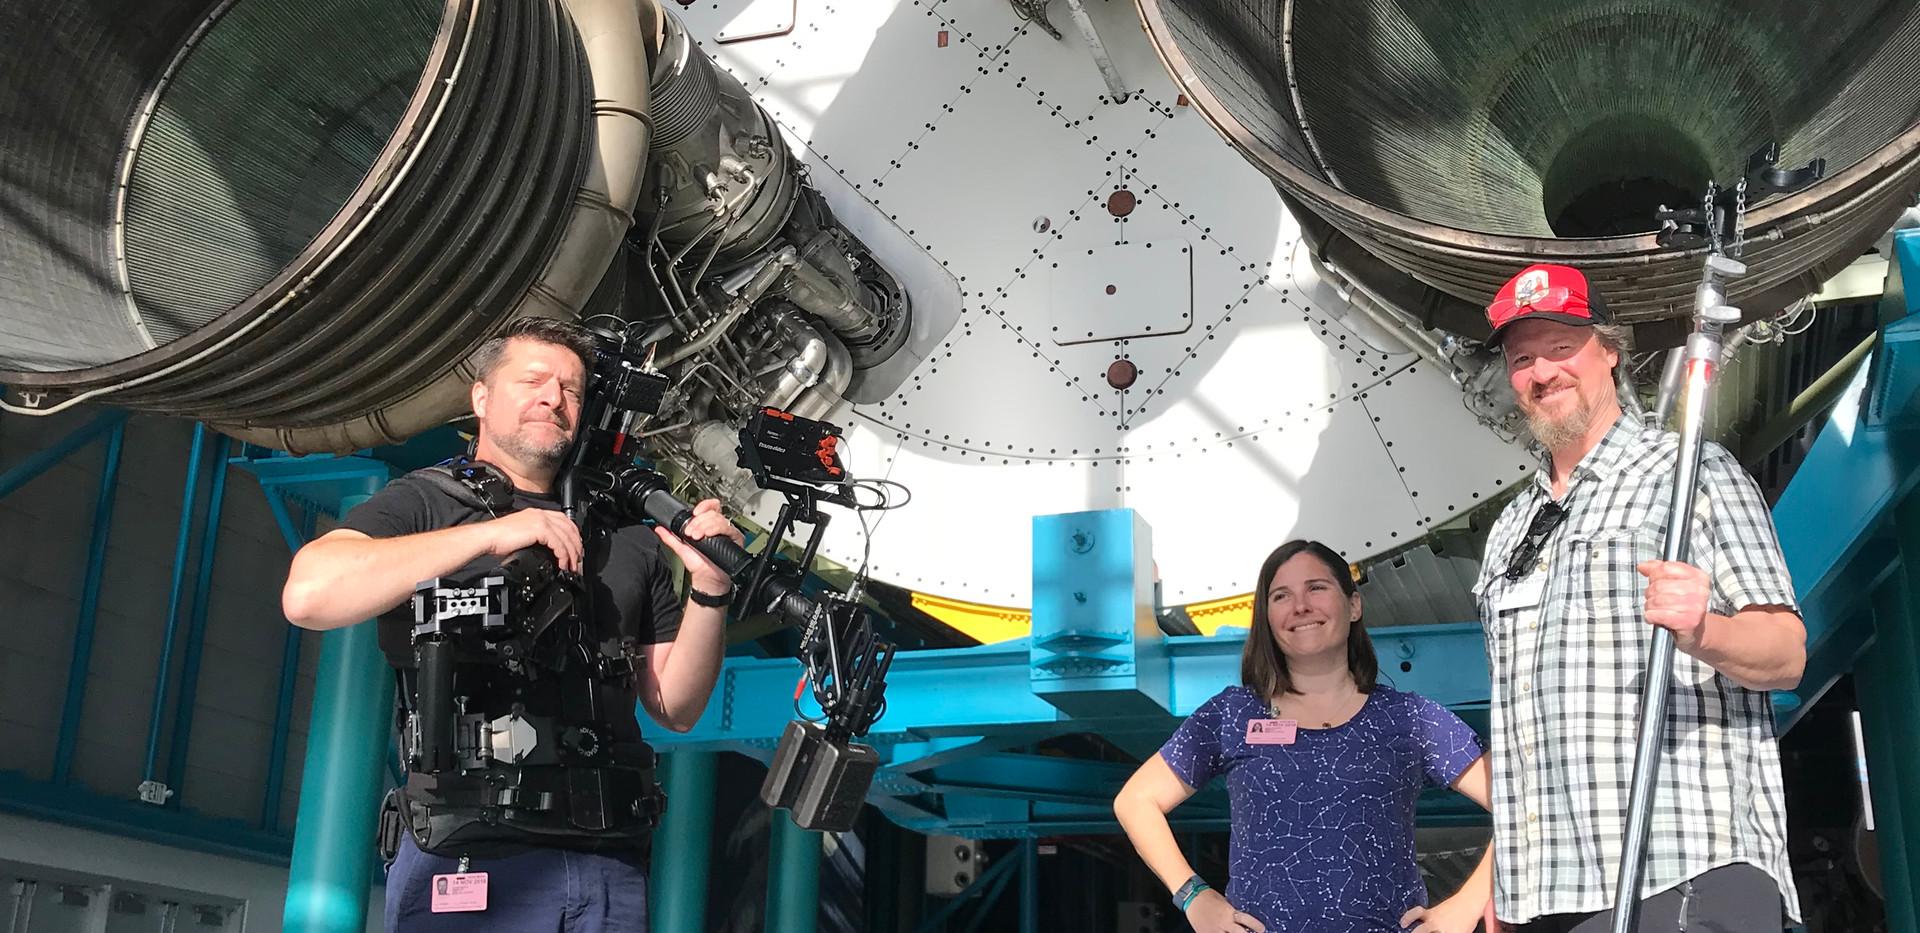 Filming the Saturn V at KSC